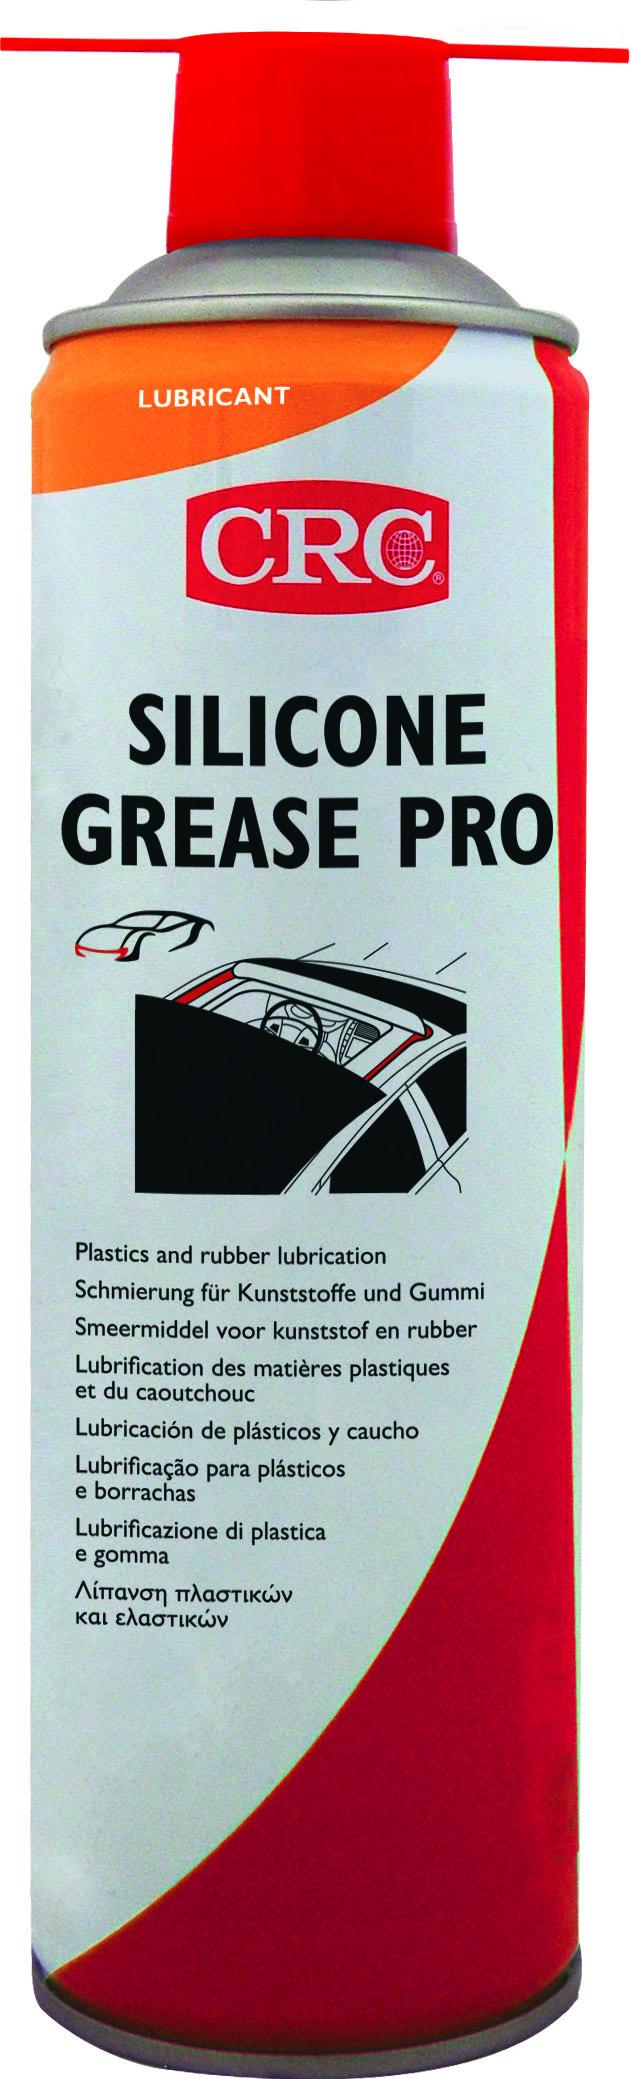 CRC silicone grease Pro aerosol 400 ml